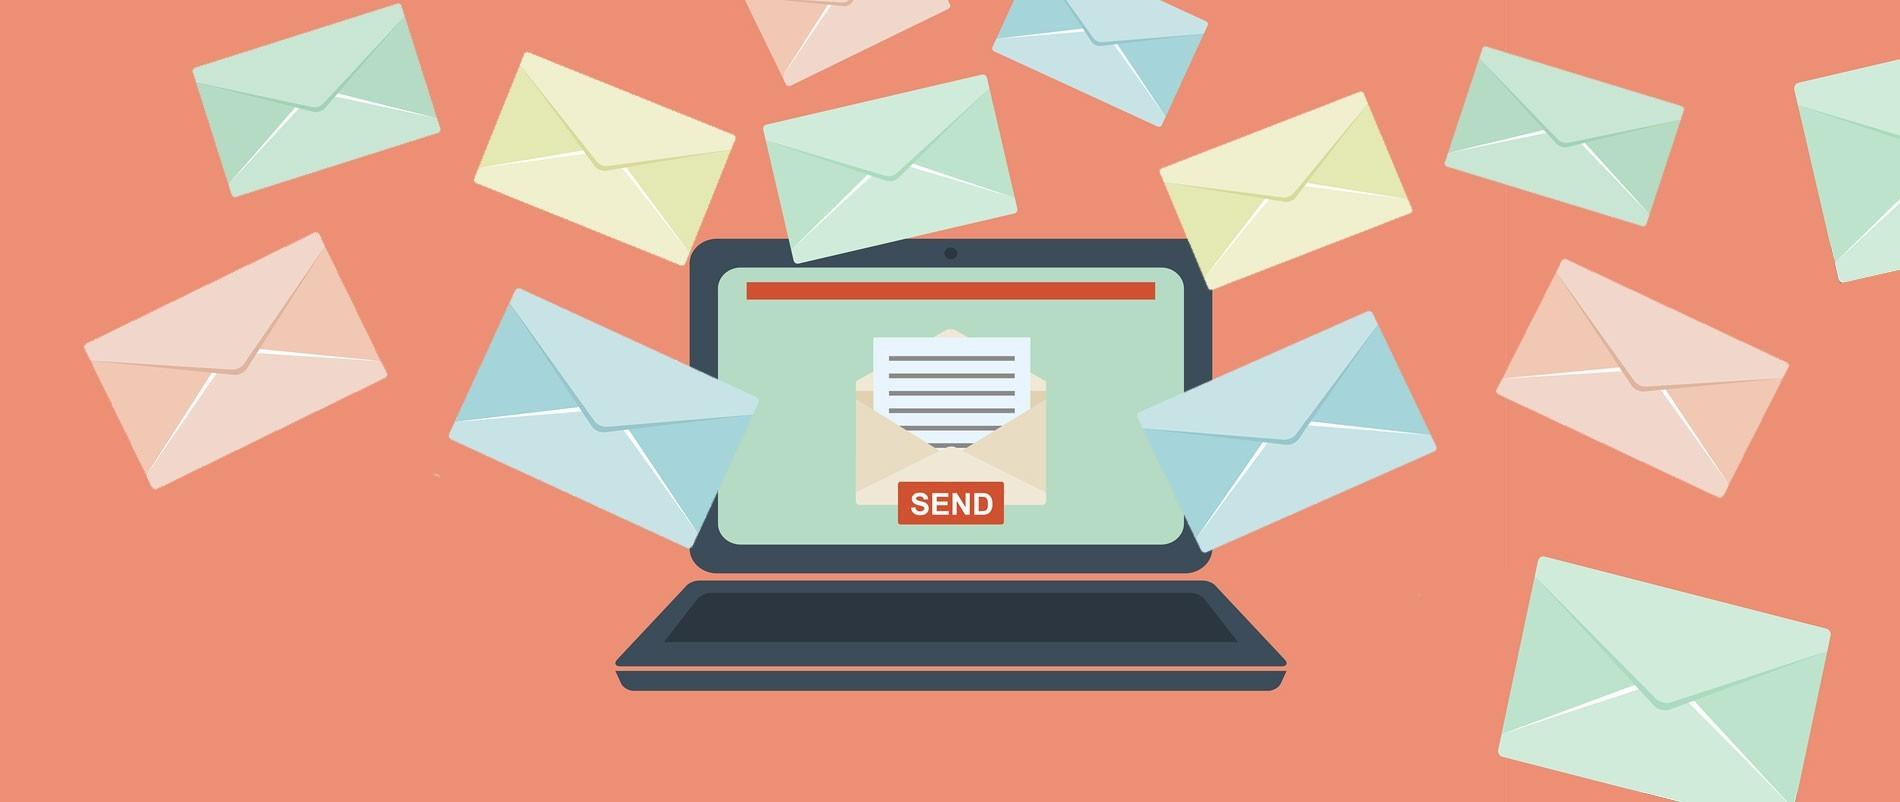 Update Contact Email ابزار تغییر ایمیل متصل به هاست